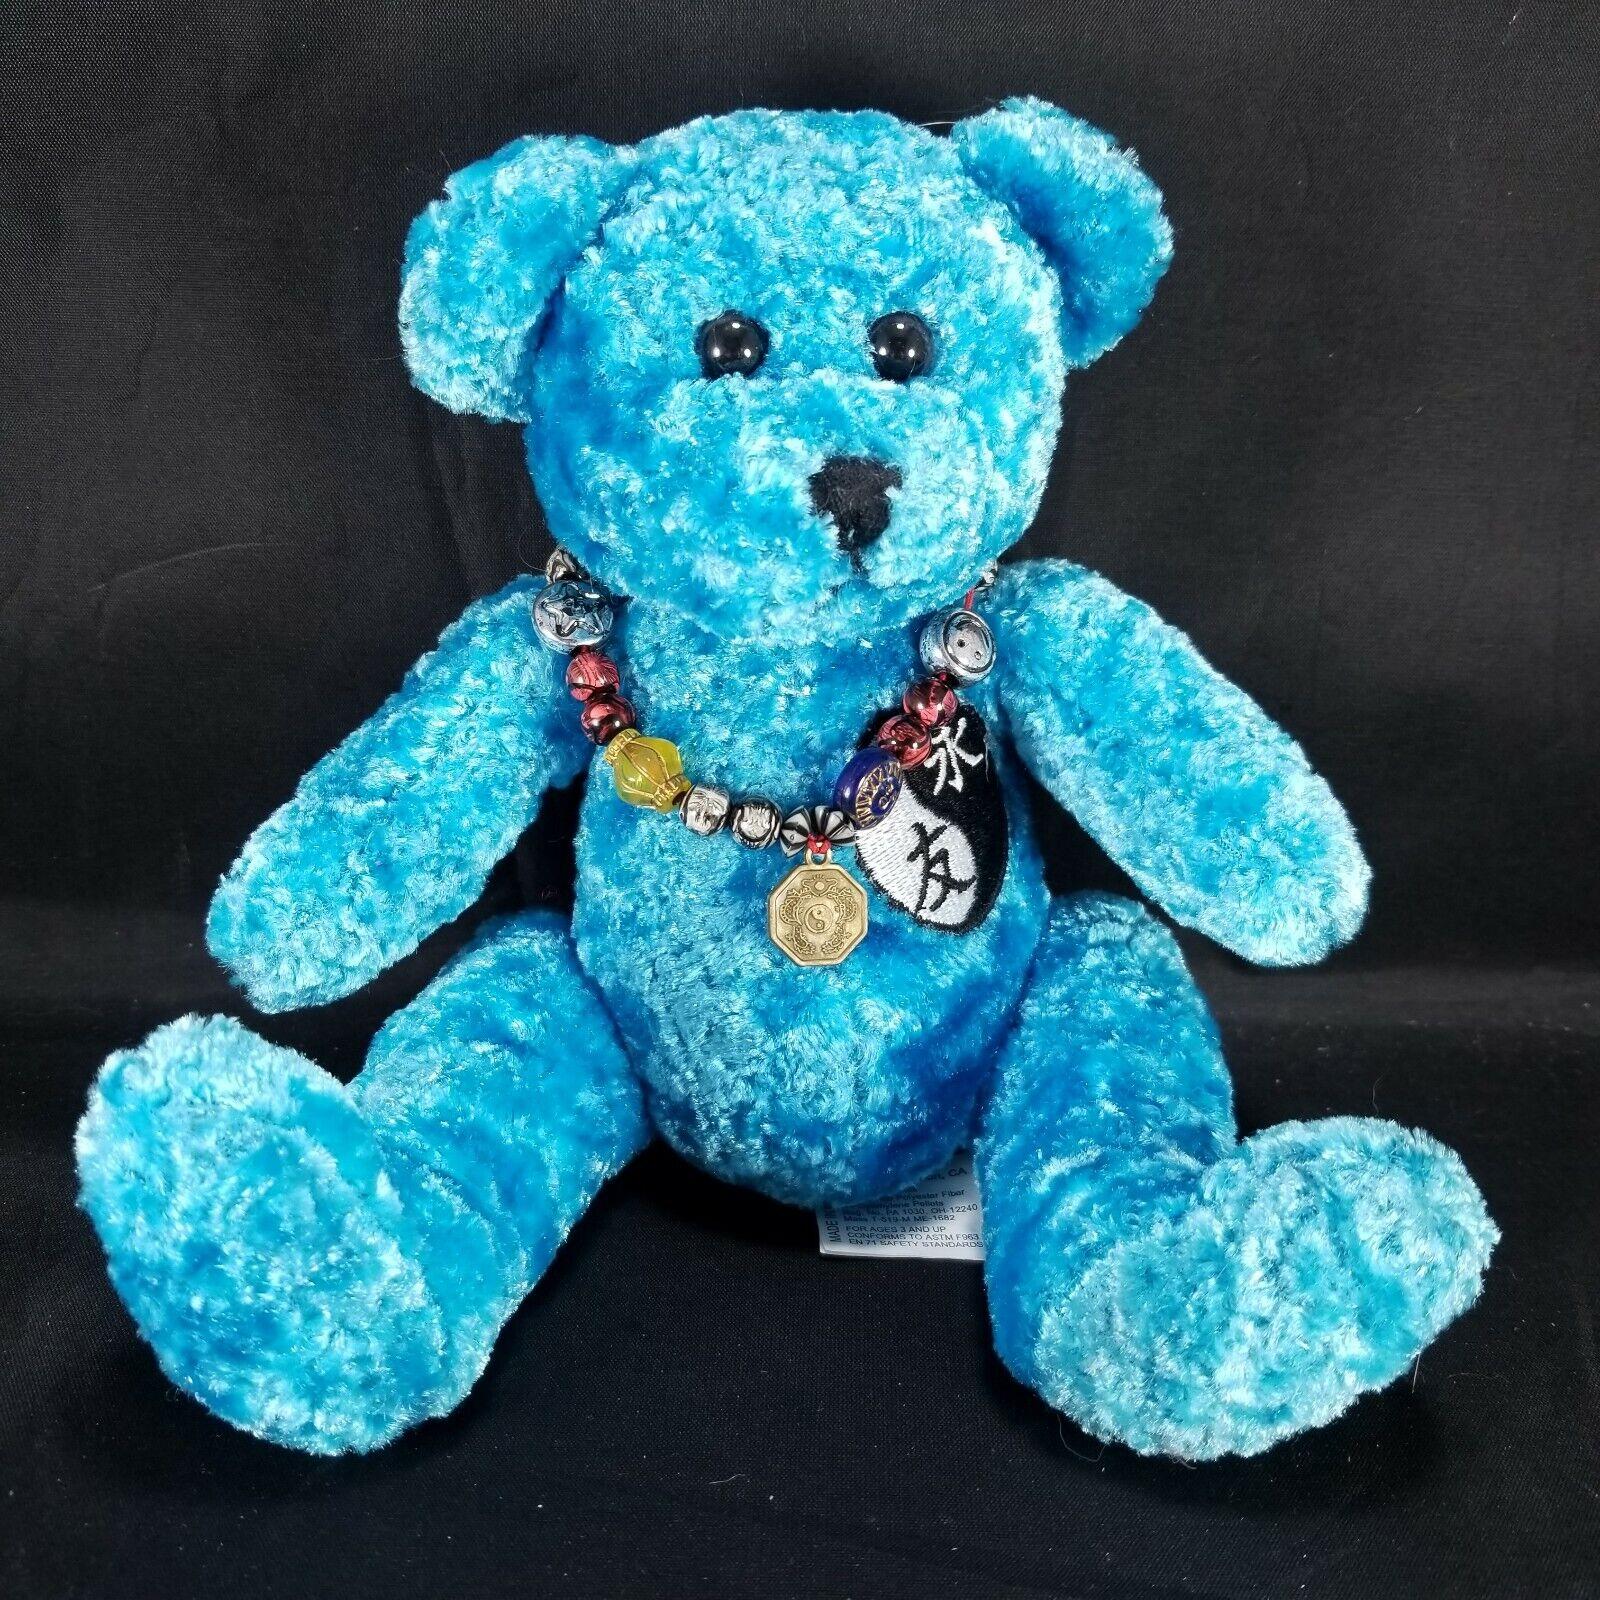 Best Stuffed Animals For Boy, Foo Forever Health Teddy Bear Plush Yin Yang Charm Bracelet Fiesta 9 Toy For Sale Online Ebay